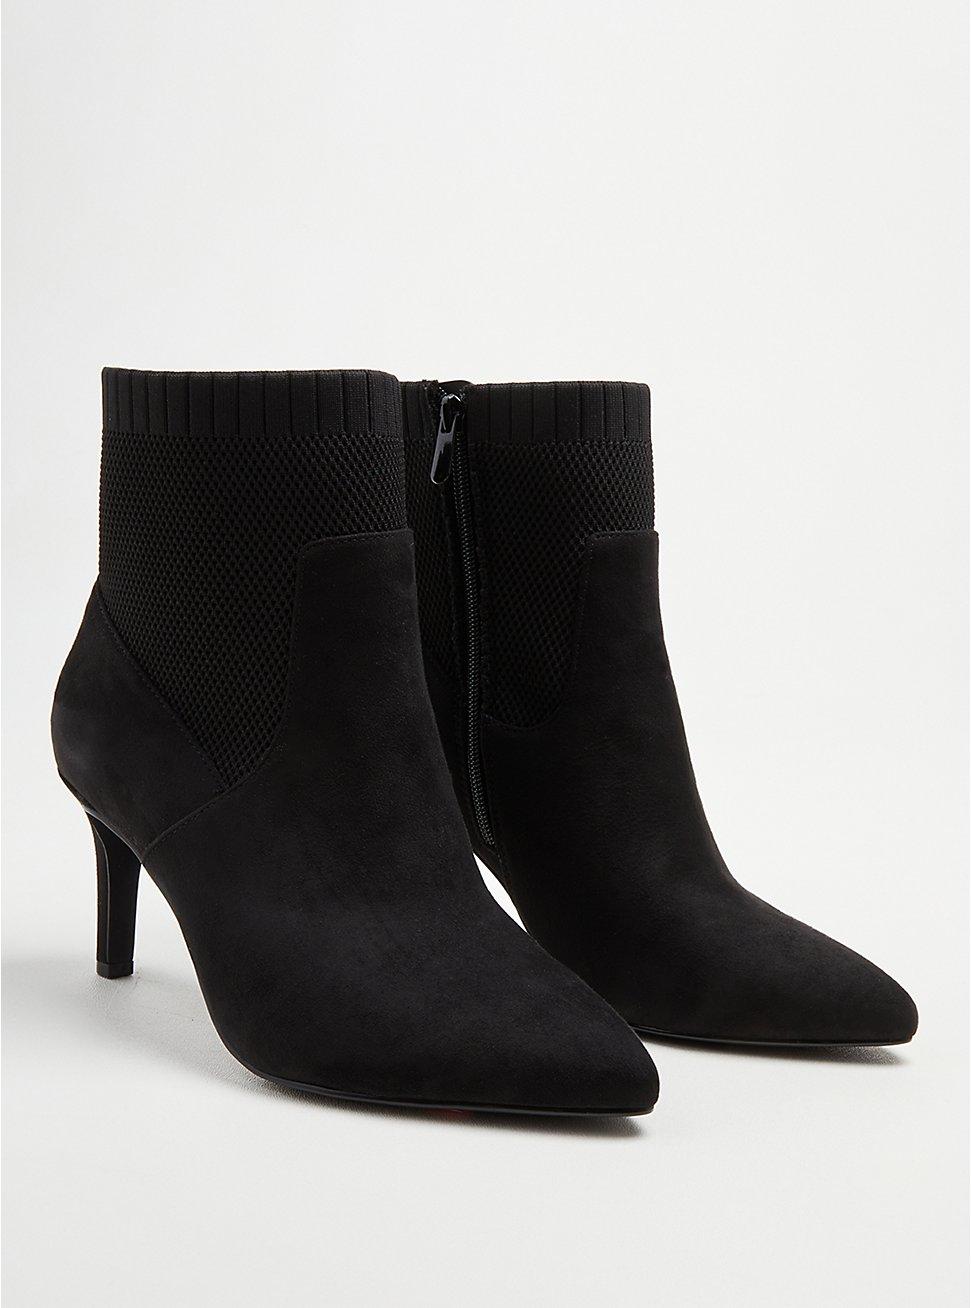 Stretch Heel Bootie - Faux Suede Black (WW), BLACK, hi-res